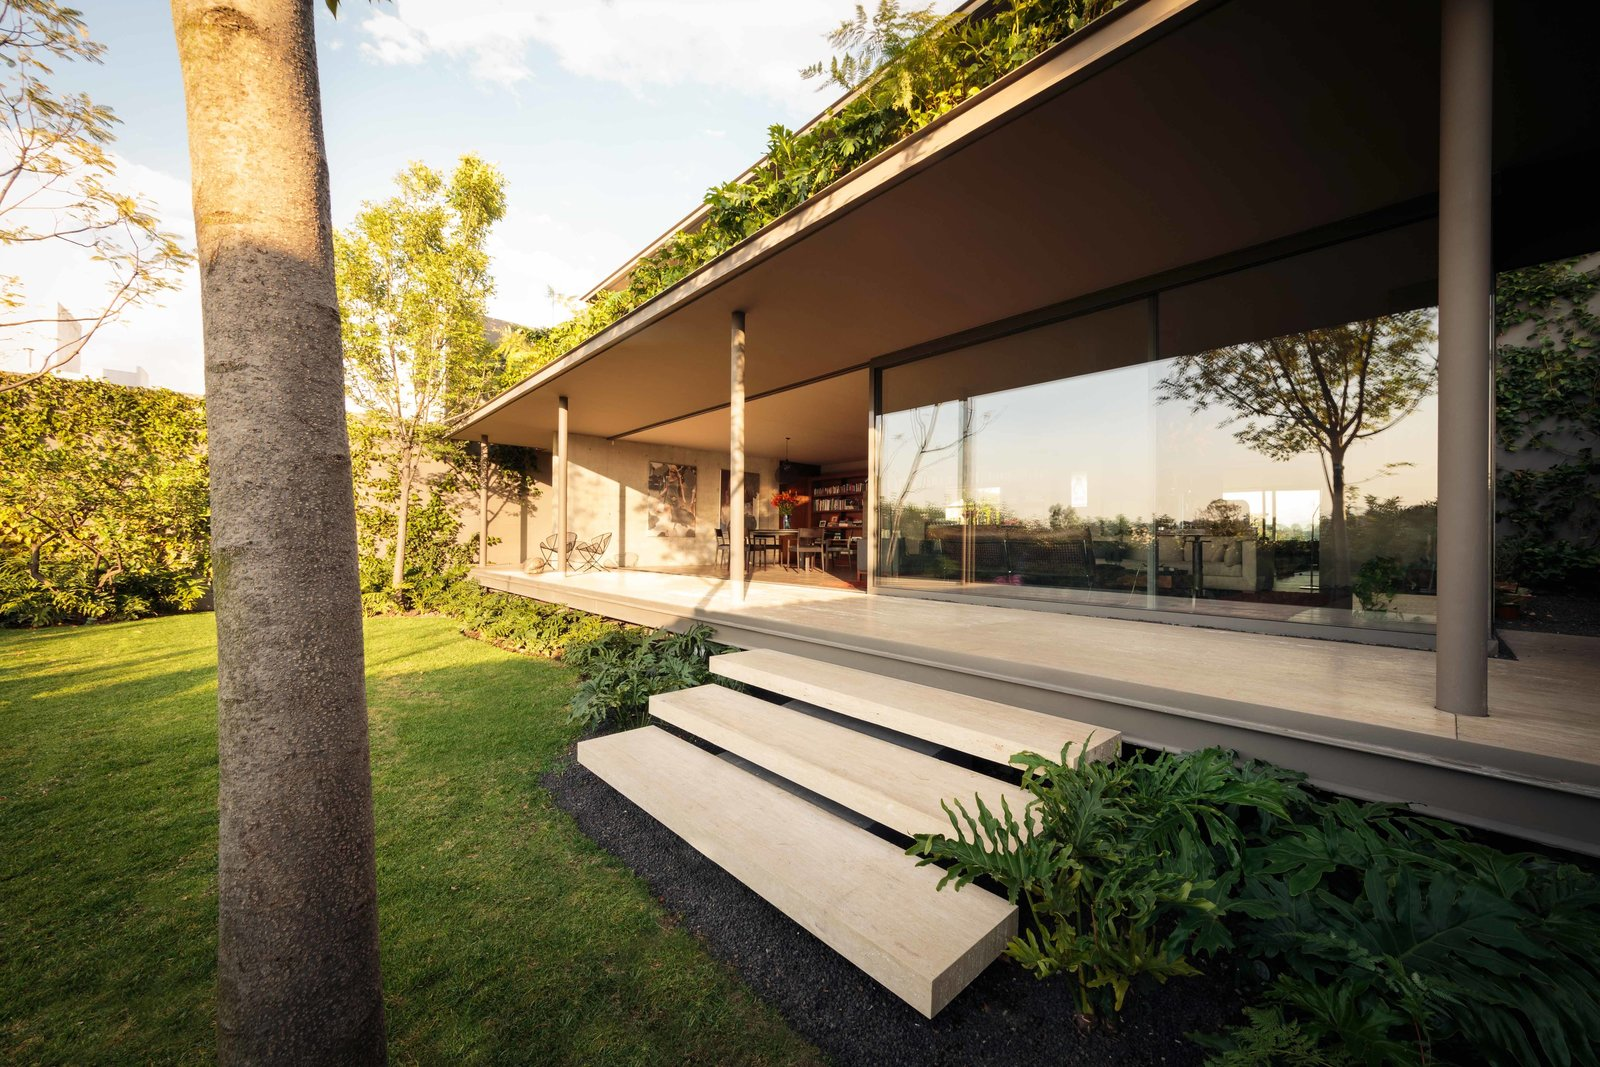 Outdoor, Trees, Shrubs, Grass, Back Yard, and Large Patio, Porch, Deck CAUCASO  Caucaso by Jose Juan Rivera Rio